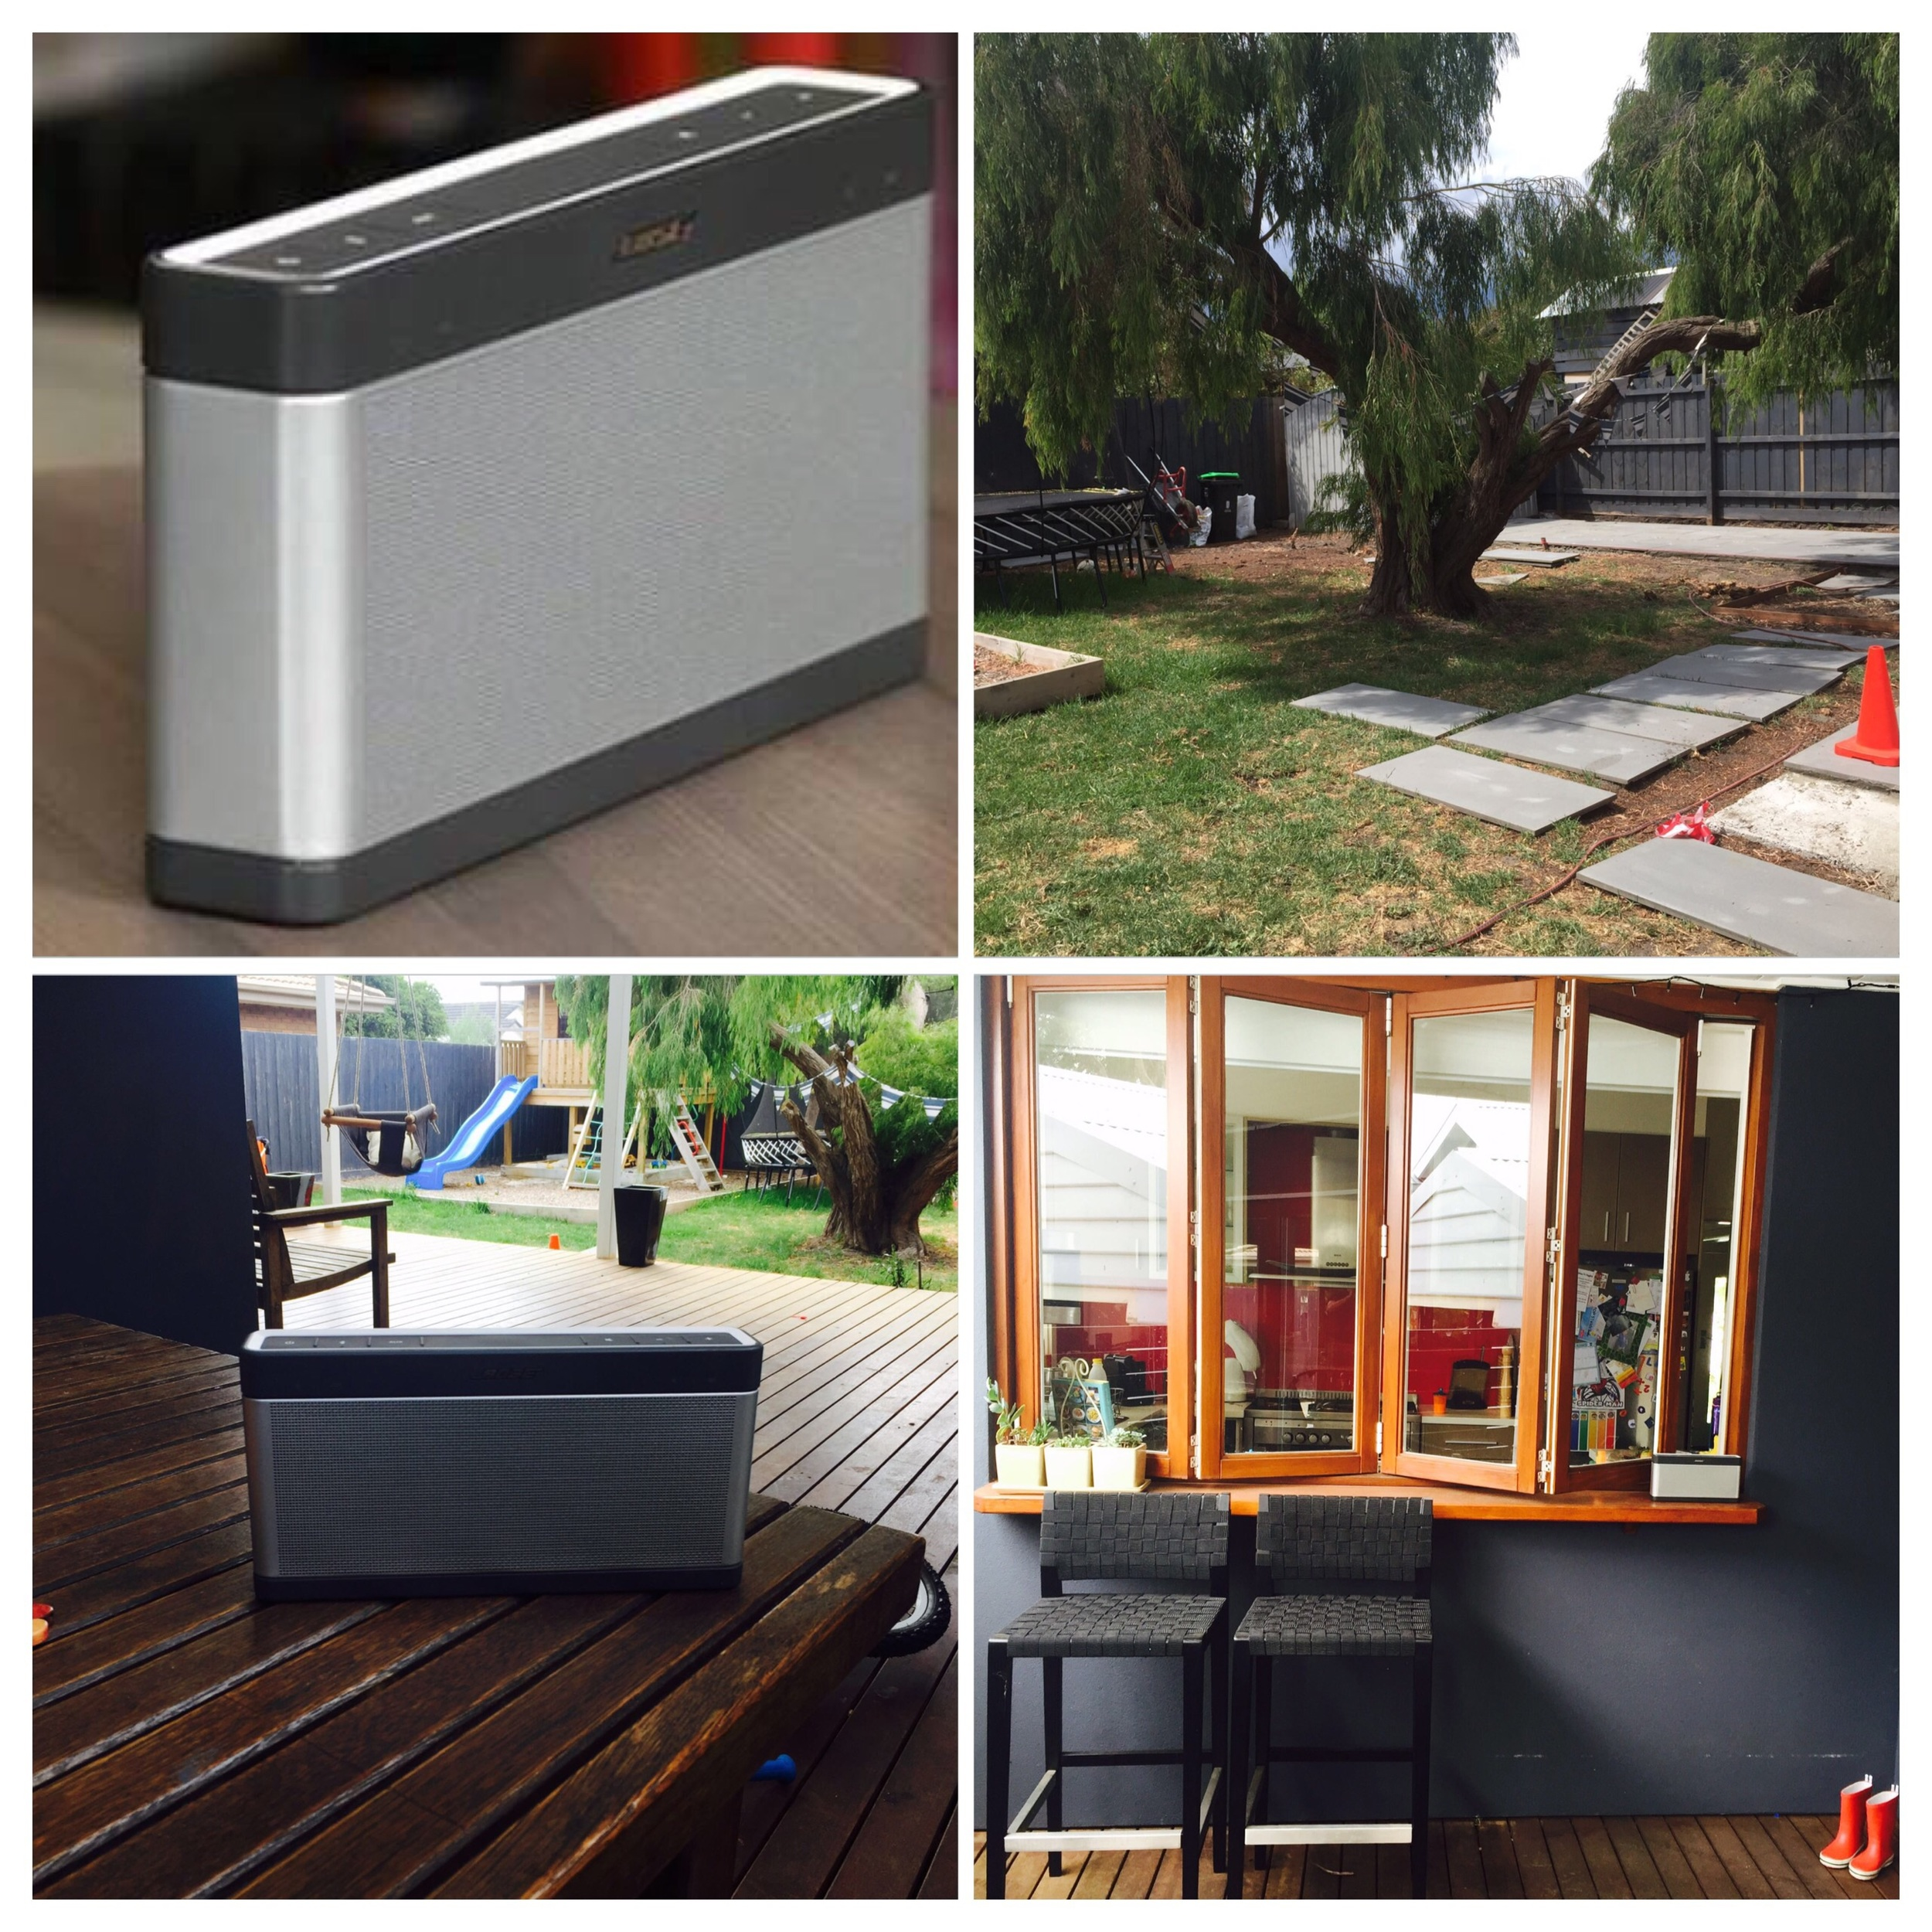 Outdoor Bluetooth Speaker Solution - Bose Soundlink Bluetooth III